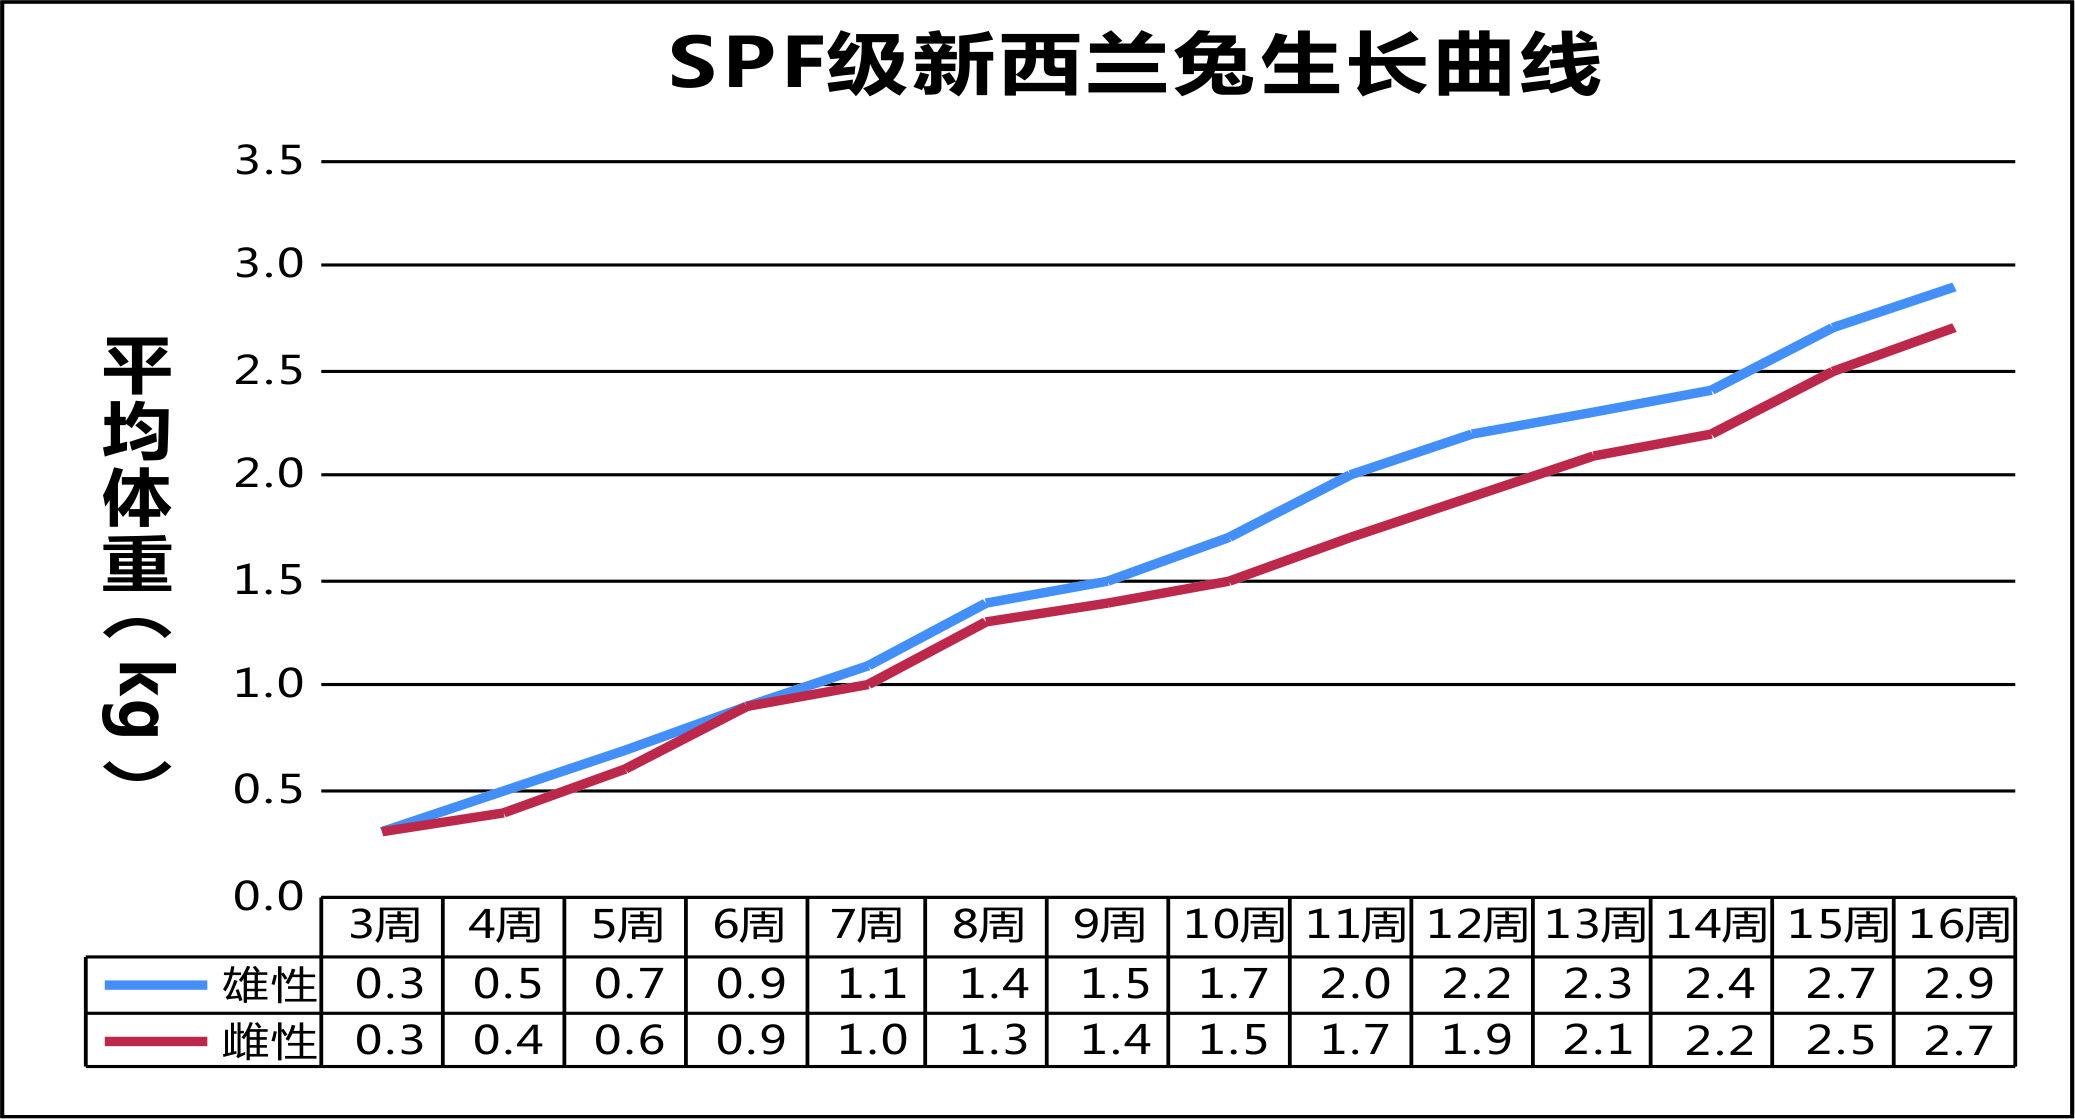 SPF级新西兰兔生长曲线.jpg